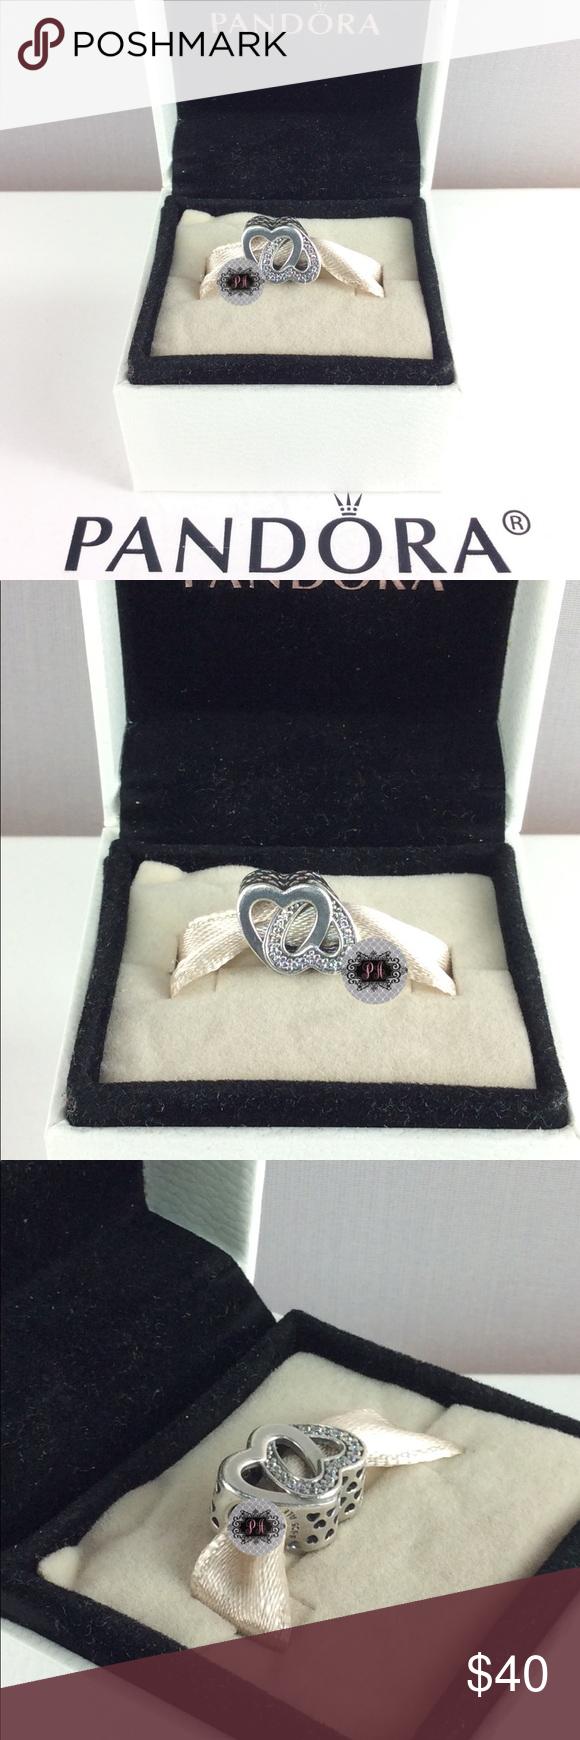 72aa645d1 New Pandora Entwined Love Charm 791880CZ 100% Authentic Pandora Entwined  Love Charm Pandora Charms.